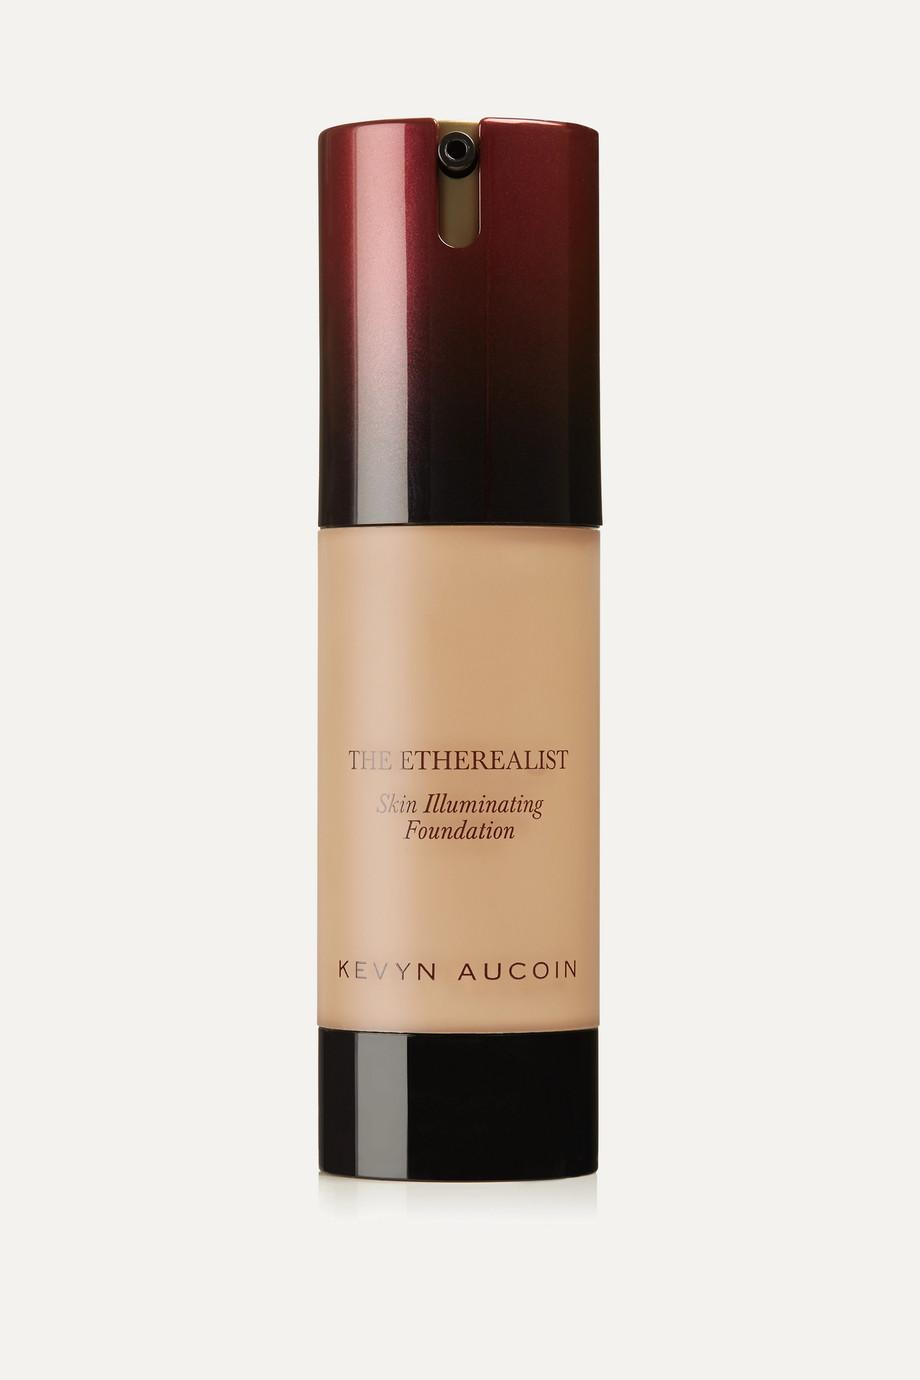 Kevyn Aucoin The Etherealist Skin Illuminating Foundation - Medium EF07